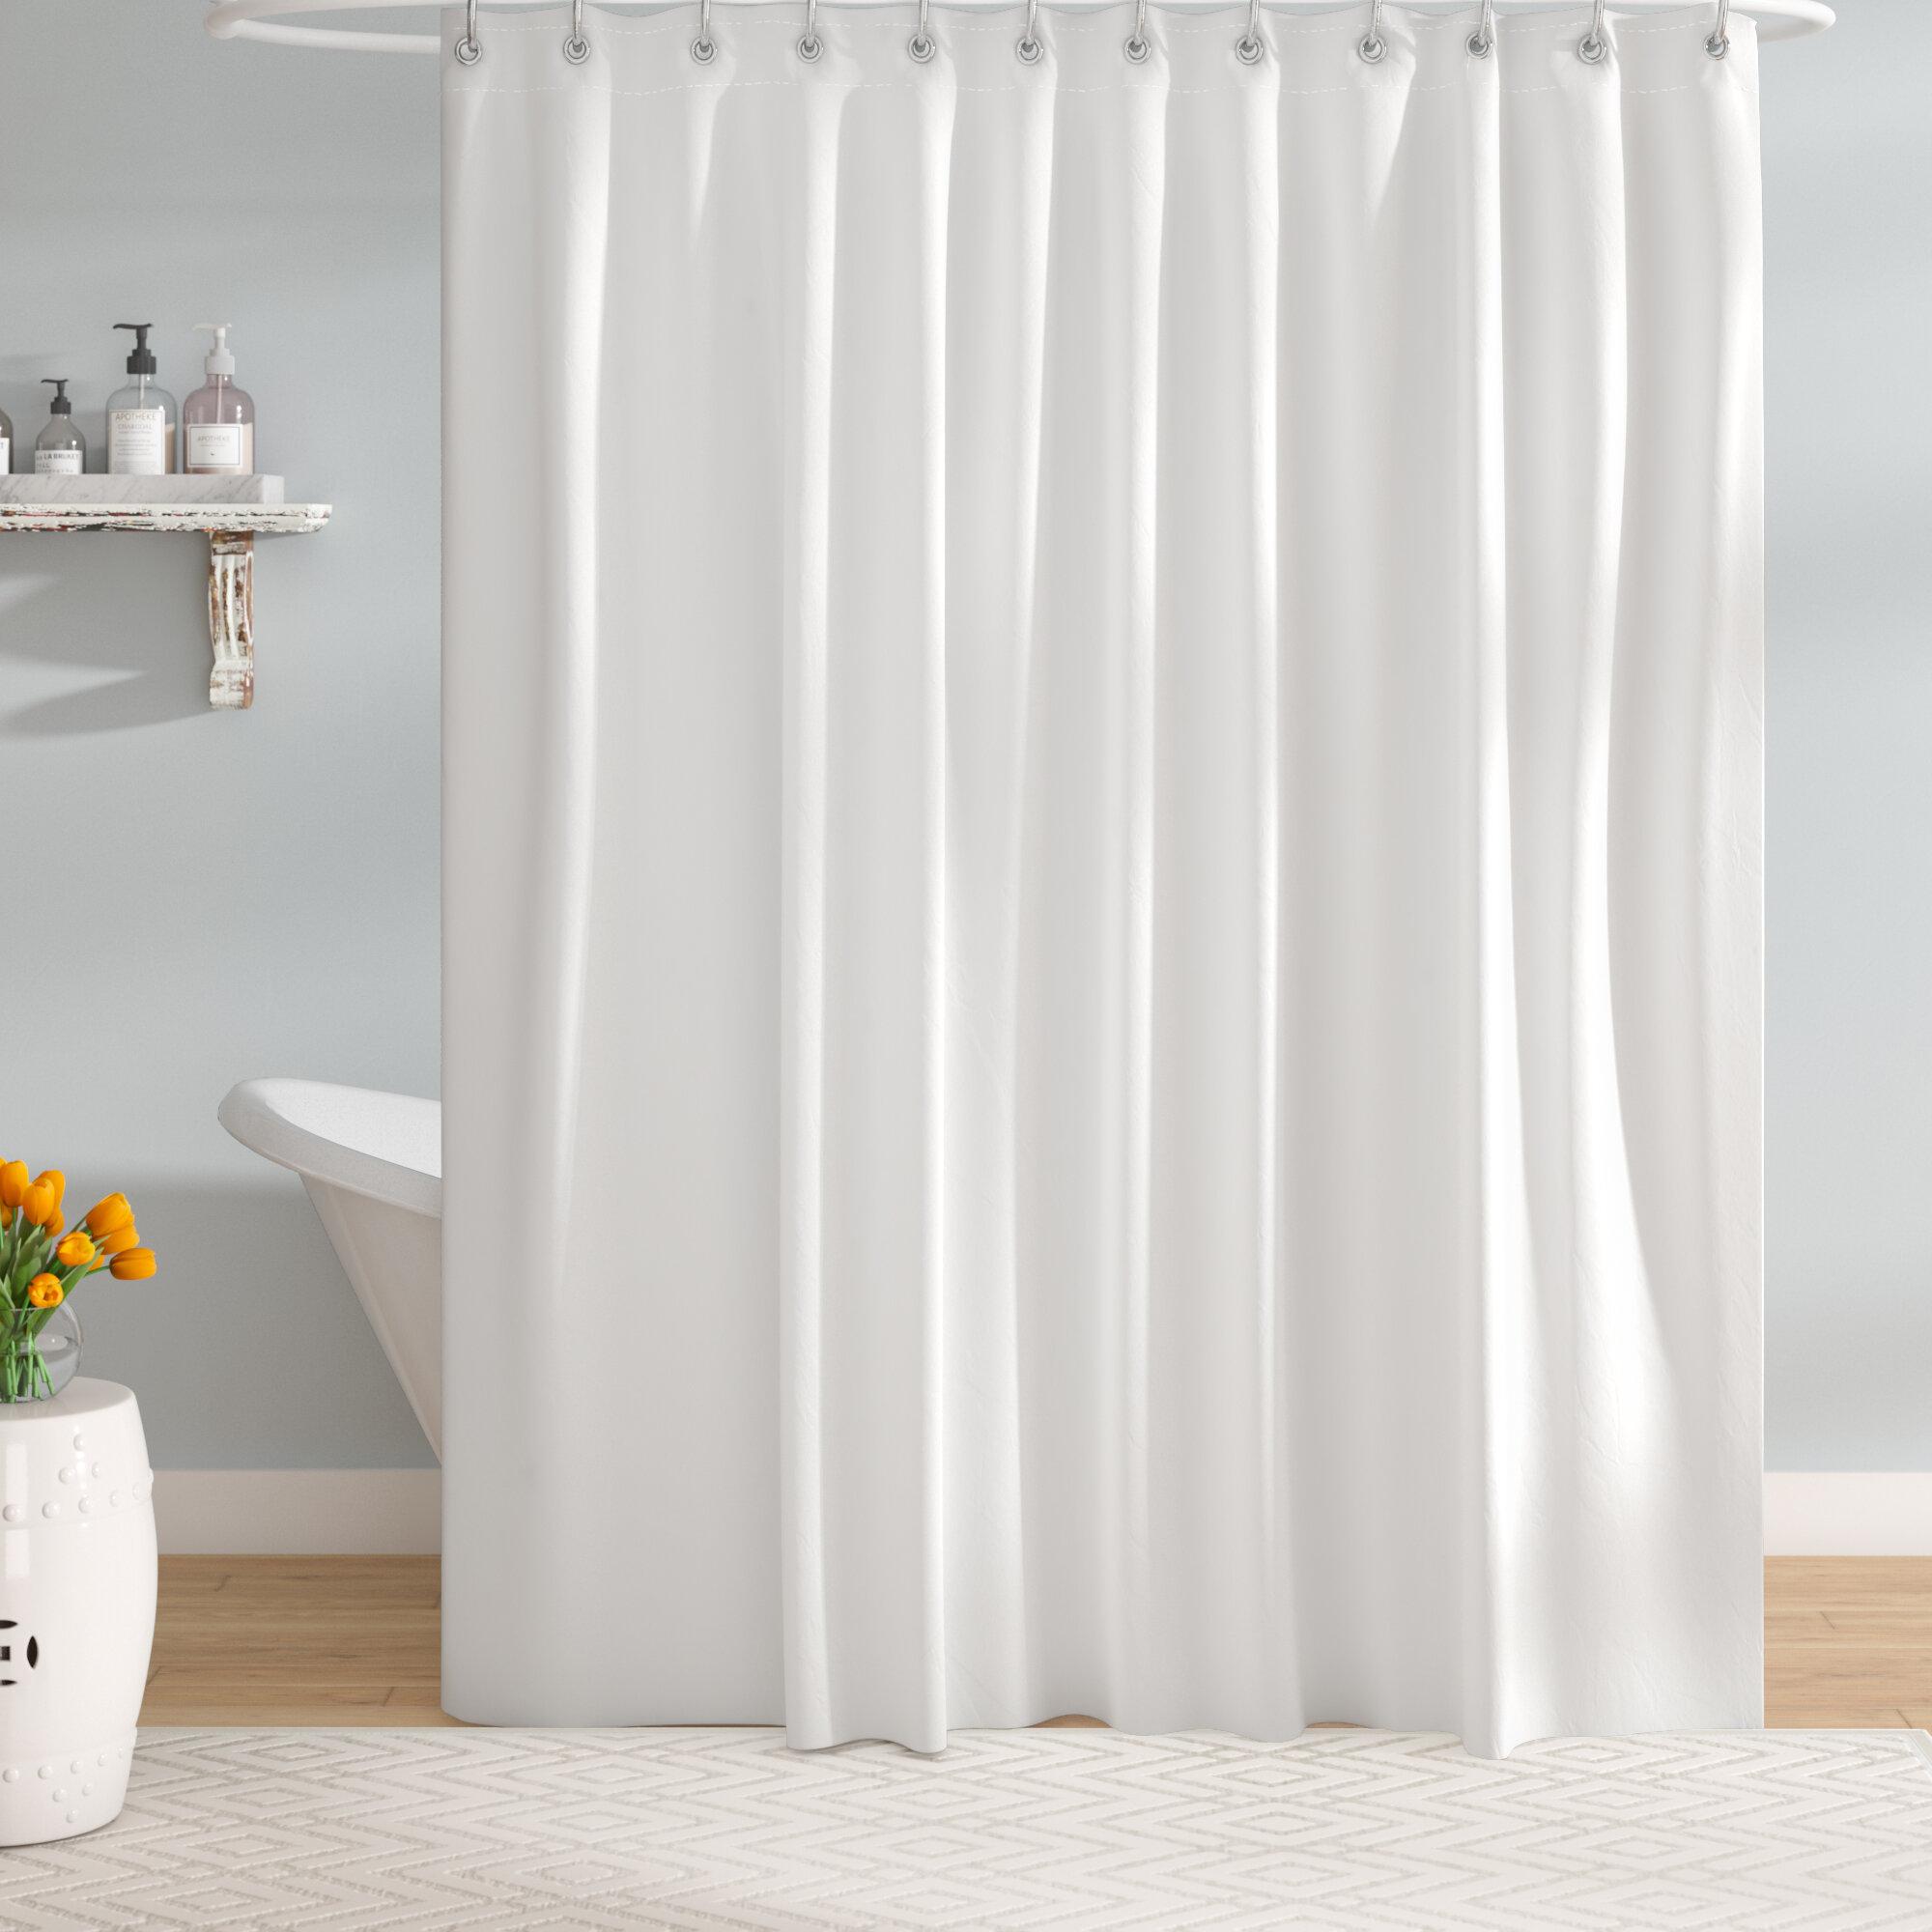 Symple Stuff EVA Shower Curtain Liner Reviews